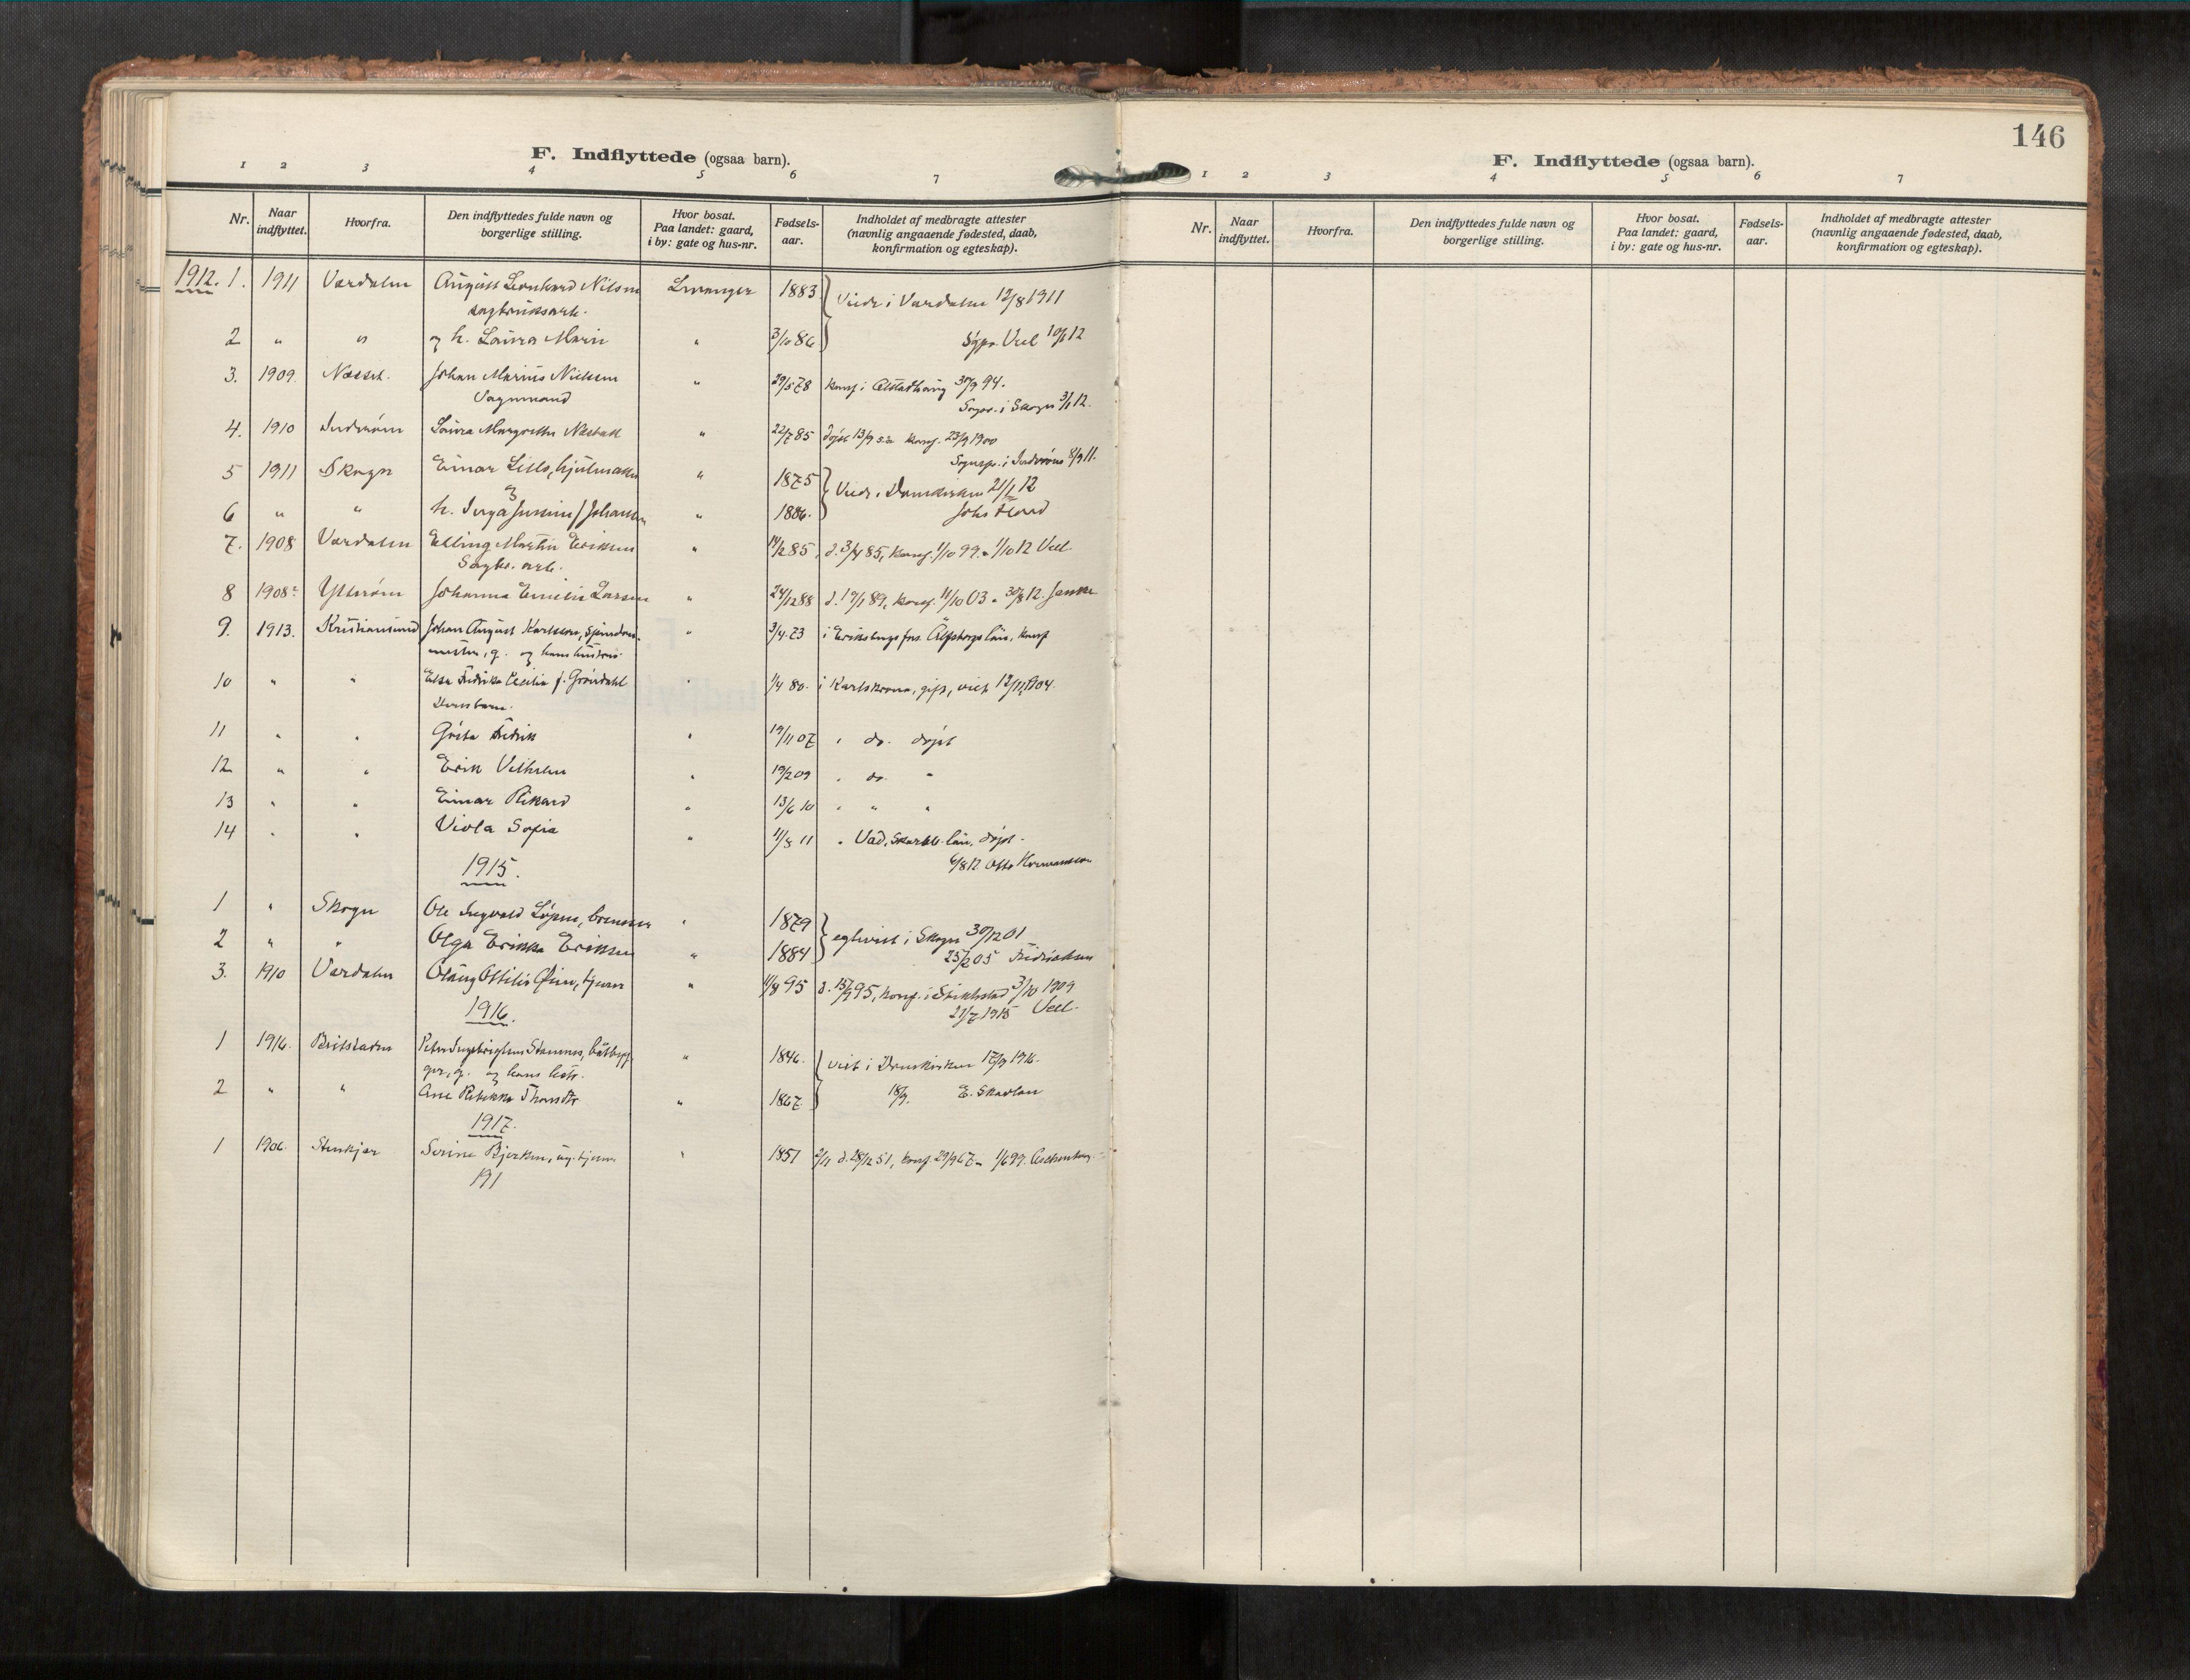 SAT, Levanger sokneprestkontor*, Parish register (official) no. 1, 1912-1932, p. 146